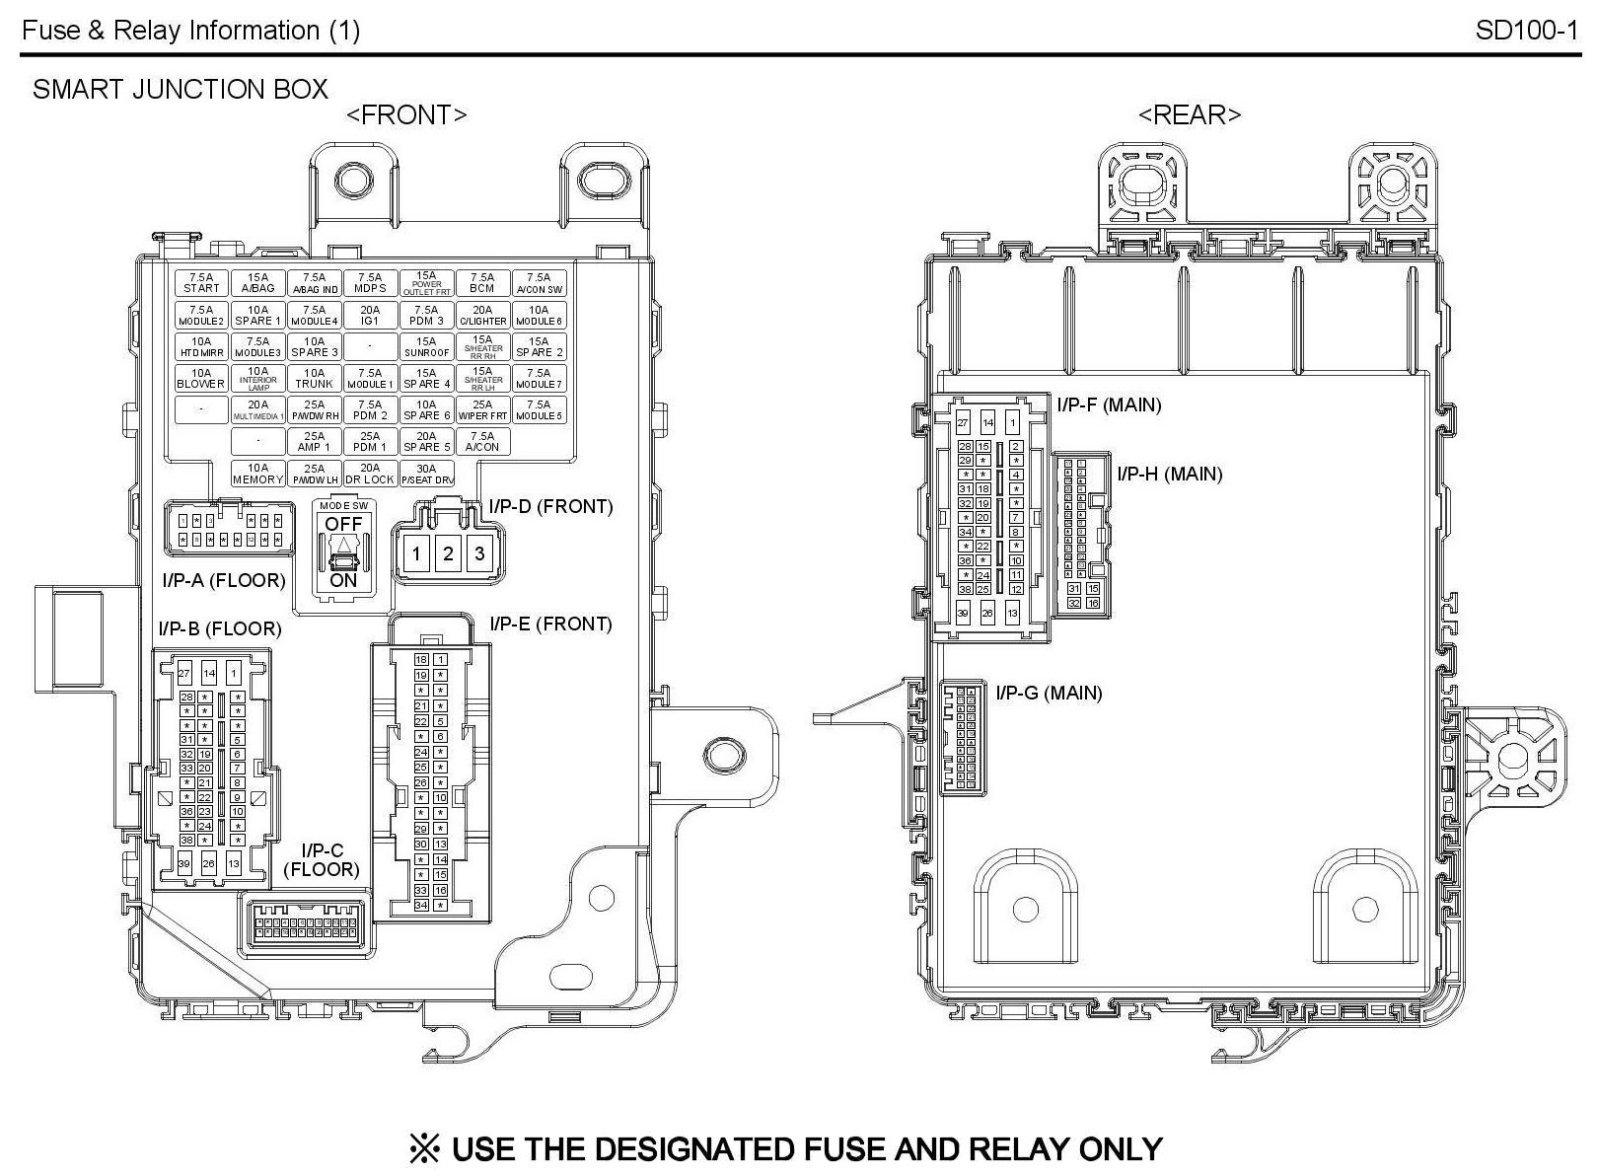 diagram] 2003 hyundai xg350 fuse box diagram full version hd quality box  diagram - diagramin.patriziobarbieri.it  diagram database - patriziobarbieri